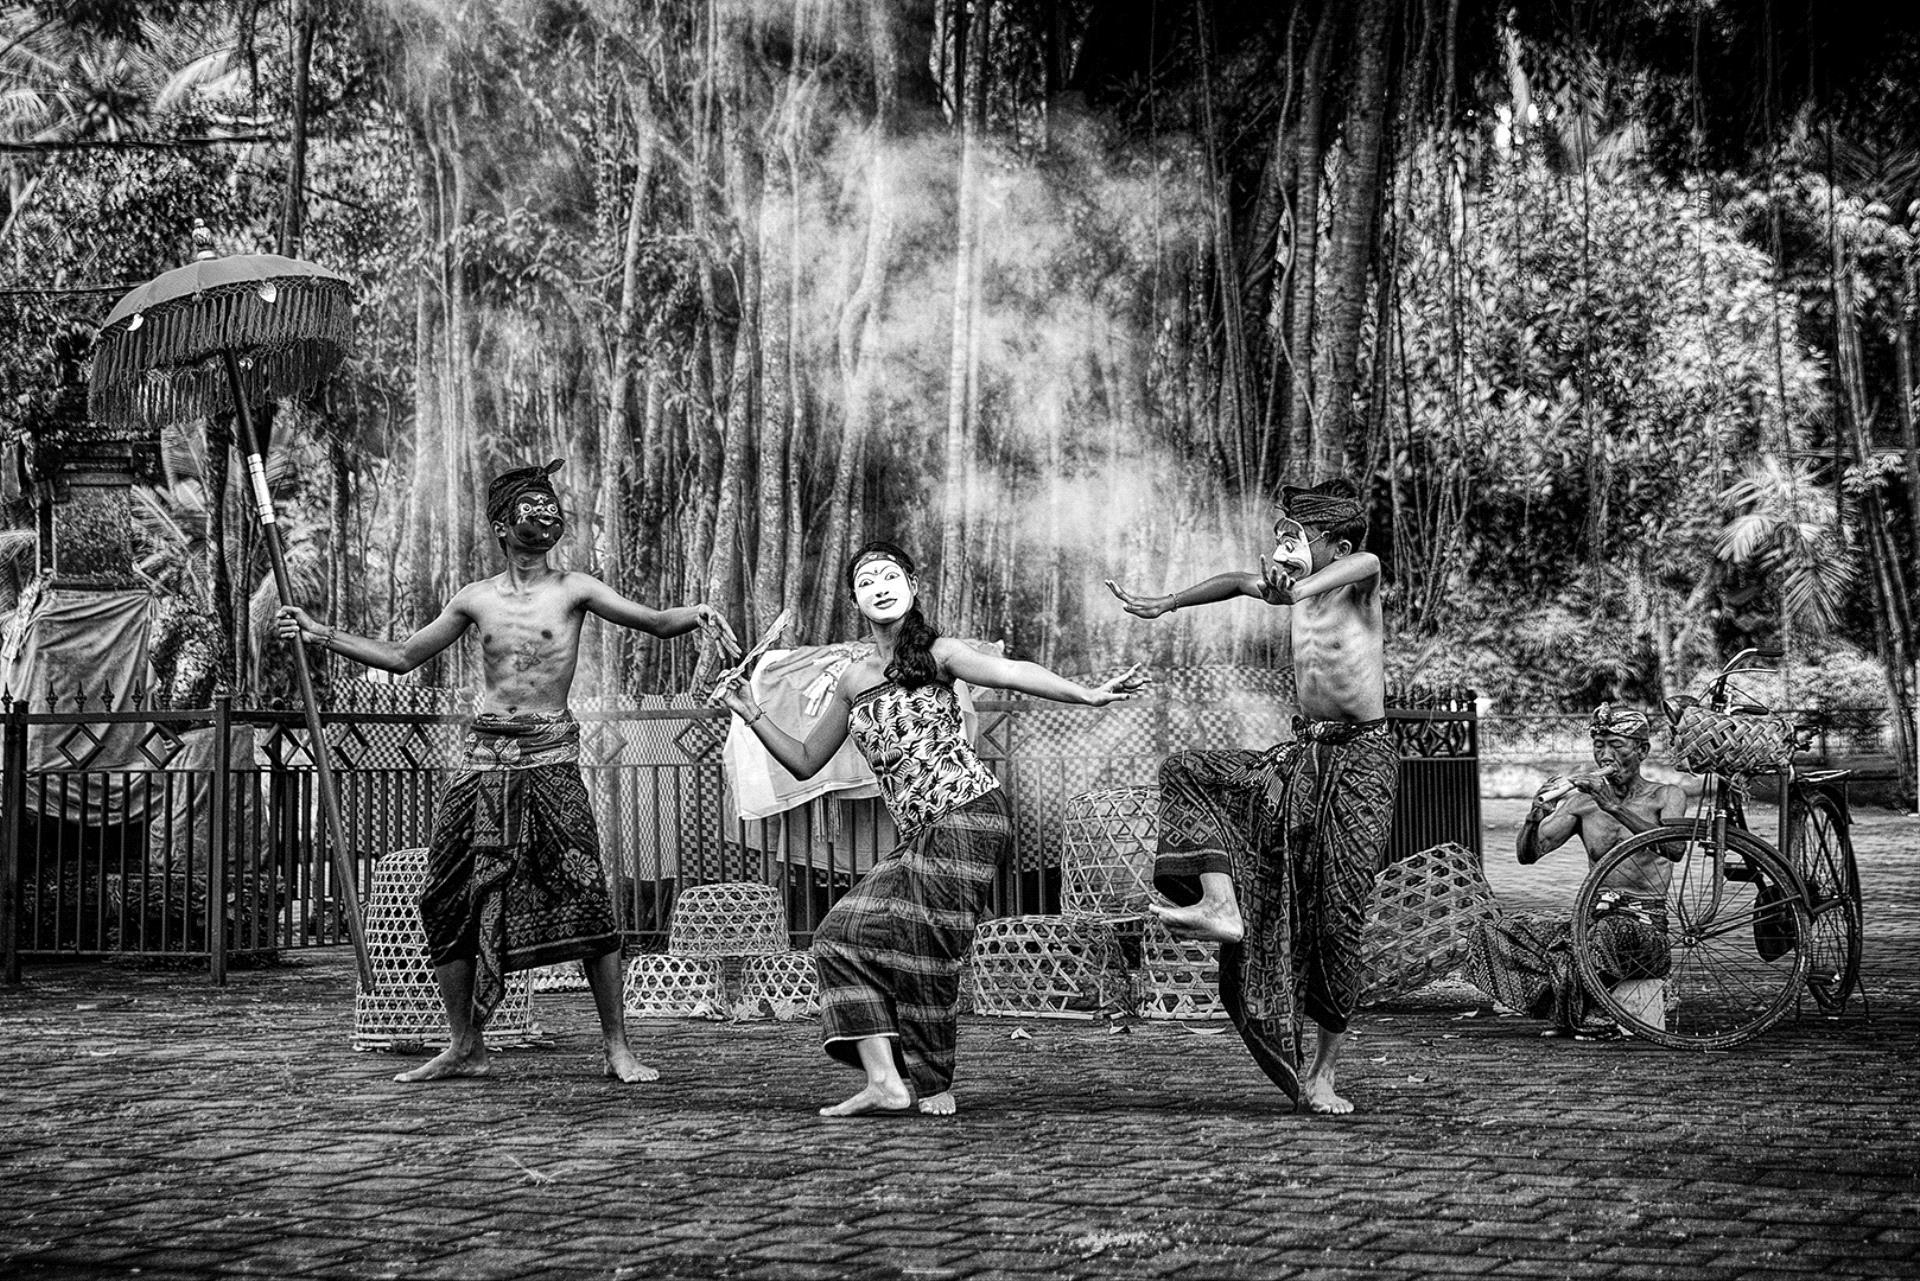 PSA HM Ribbons - Raymond Seh-Guan Goh (Singapore)  Masked Bali Dancer